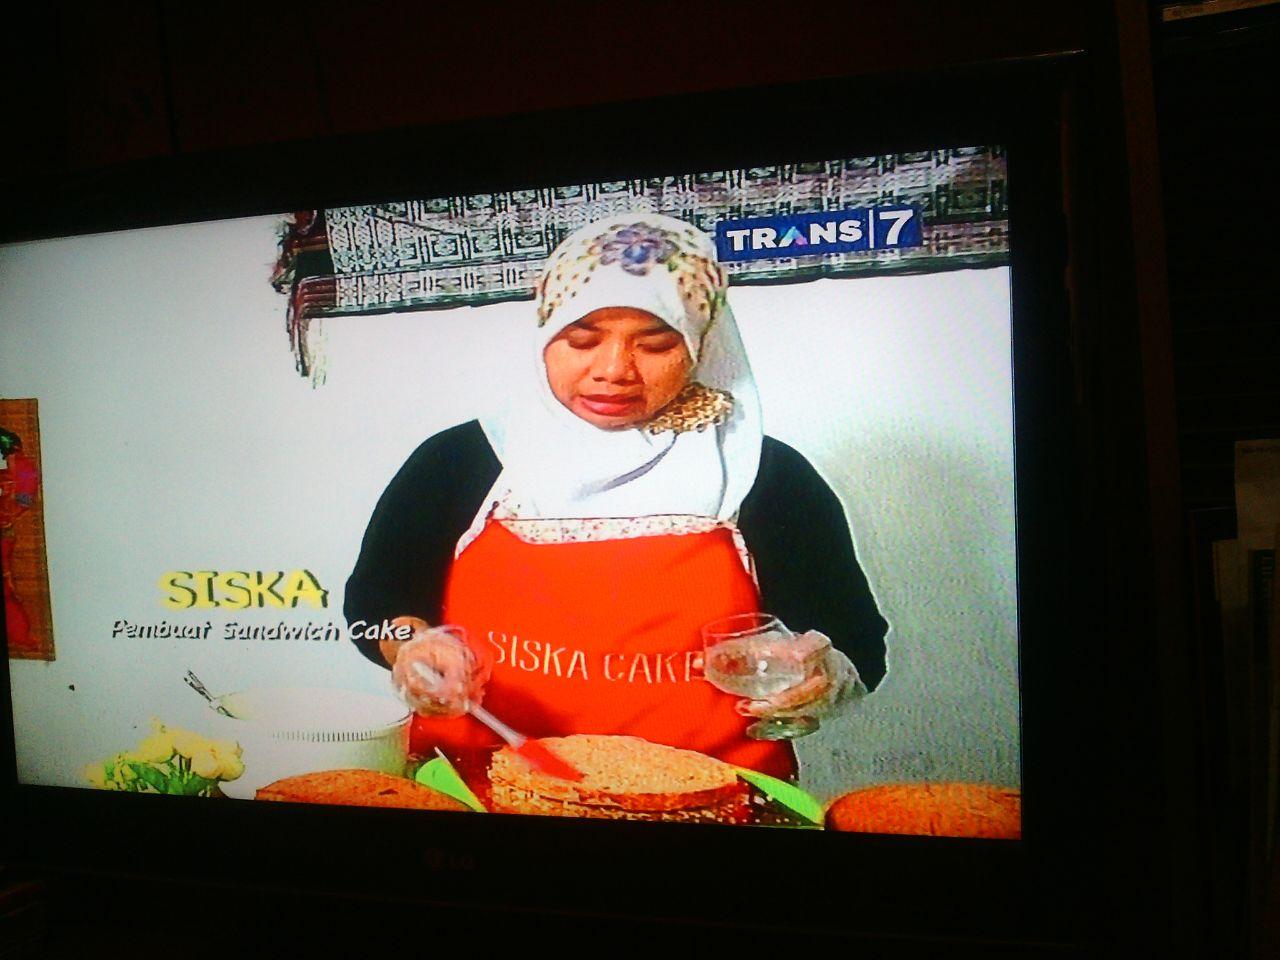 on TRANS7 TV - 1 Juli 2015